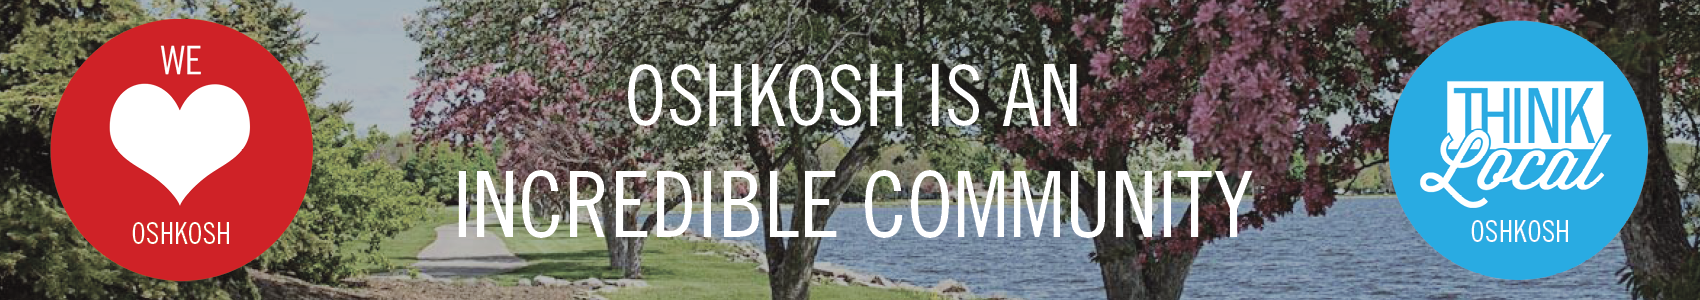 TLWebsite_OshkoshHeader.png